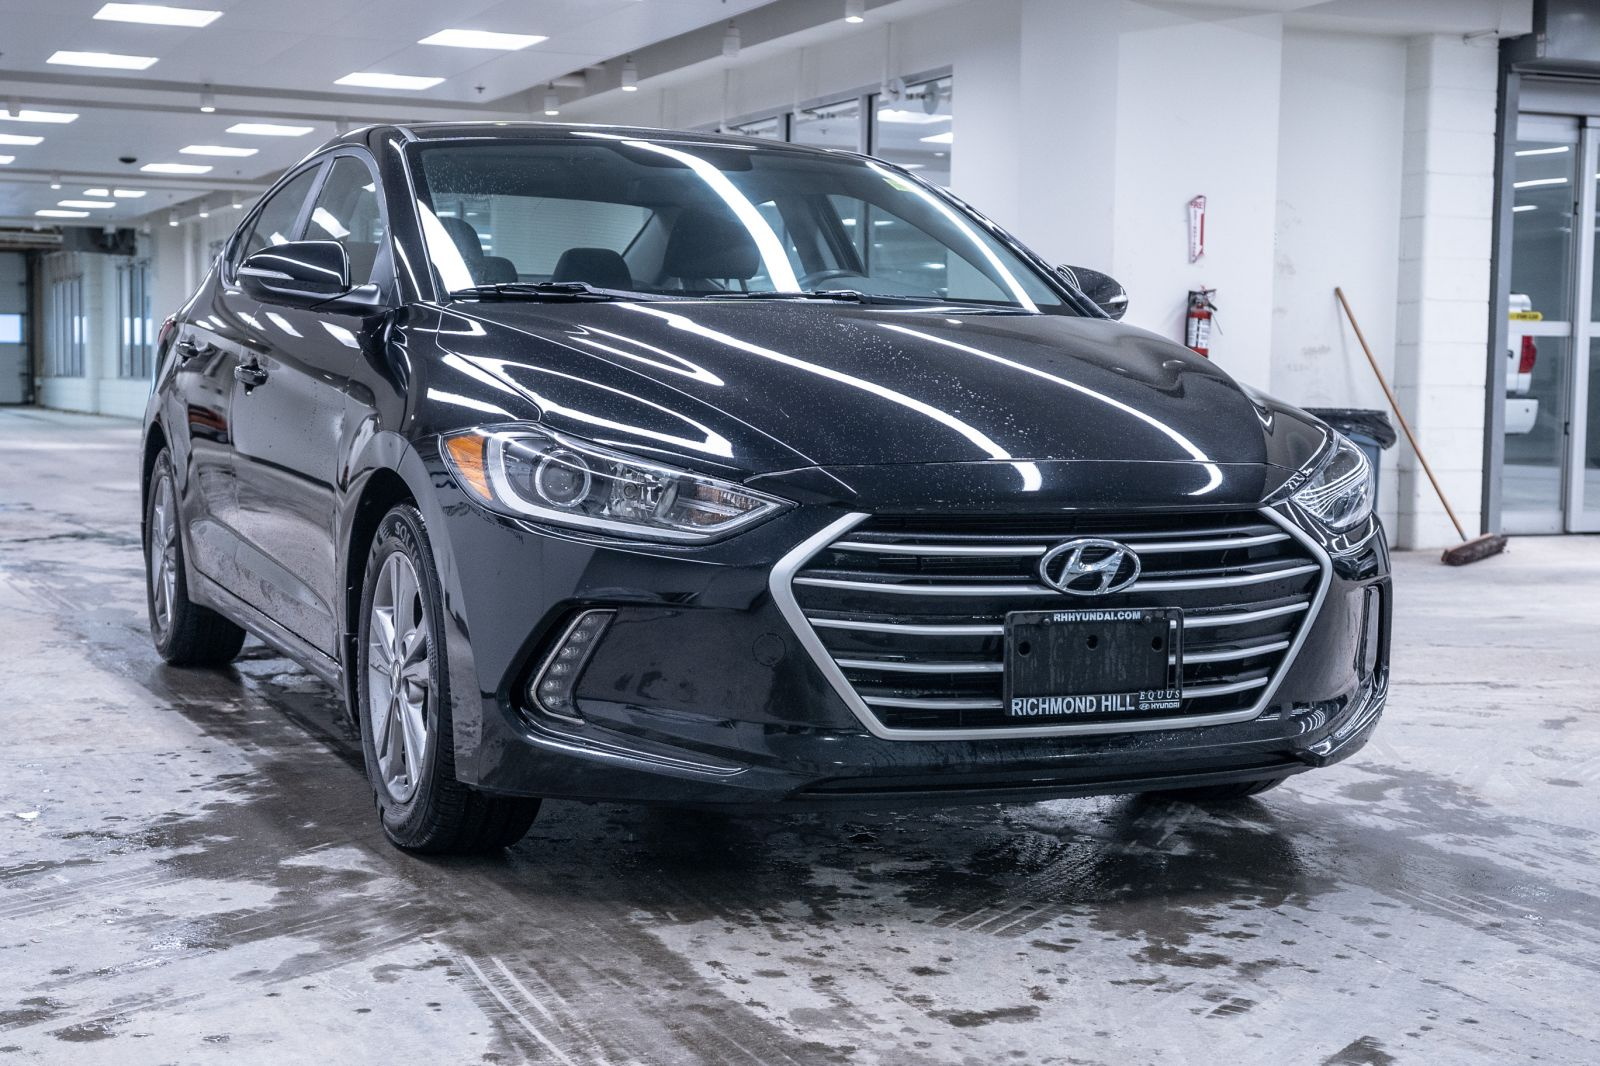 2017 Hyundai Elantra